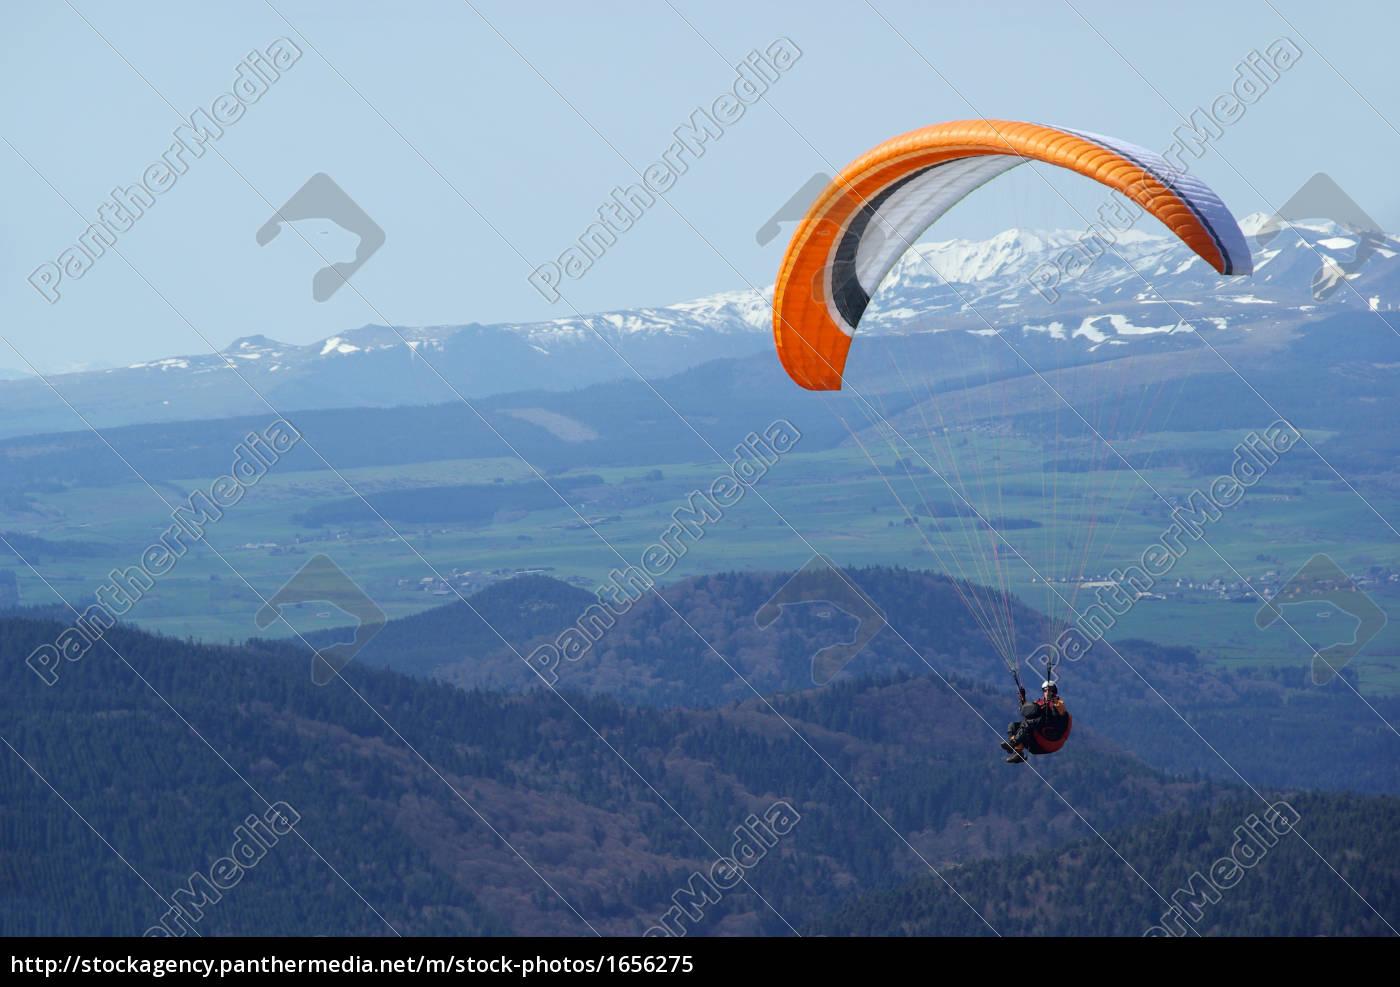 paragliding, -, paragliding, 03 - 1656275